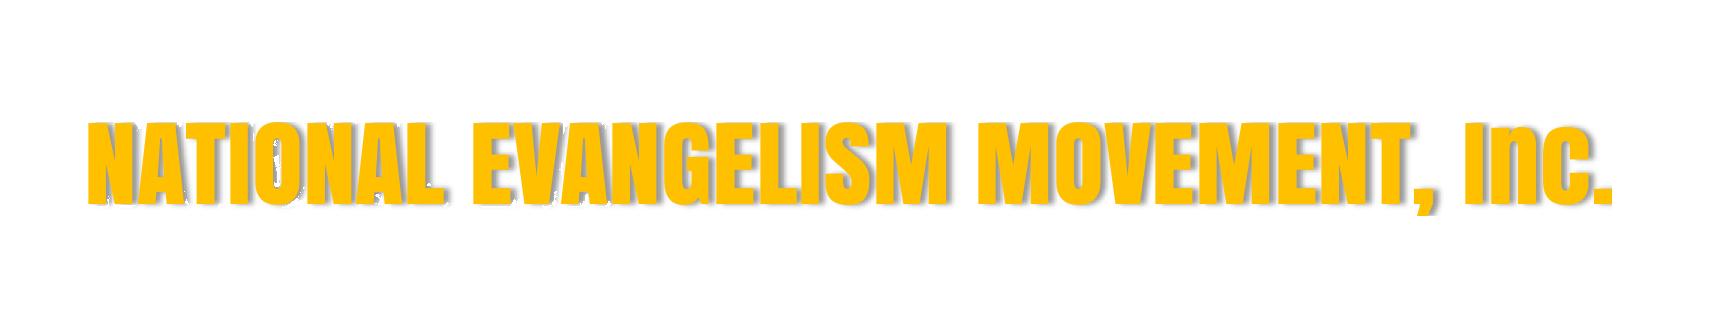 National Evangelism Movement Logo